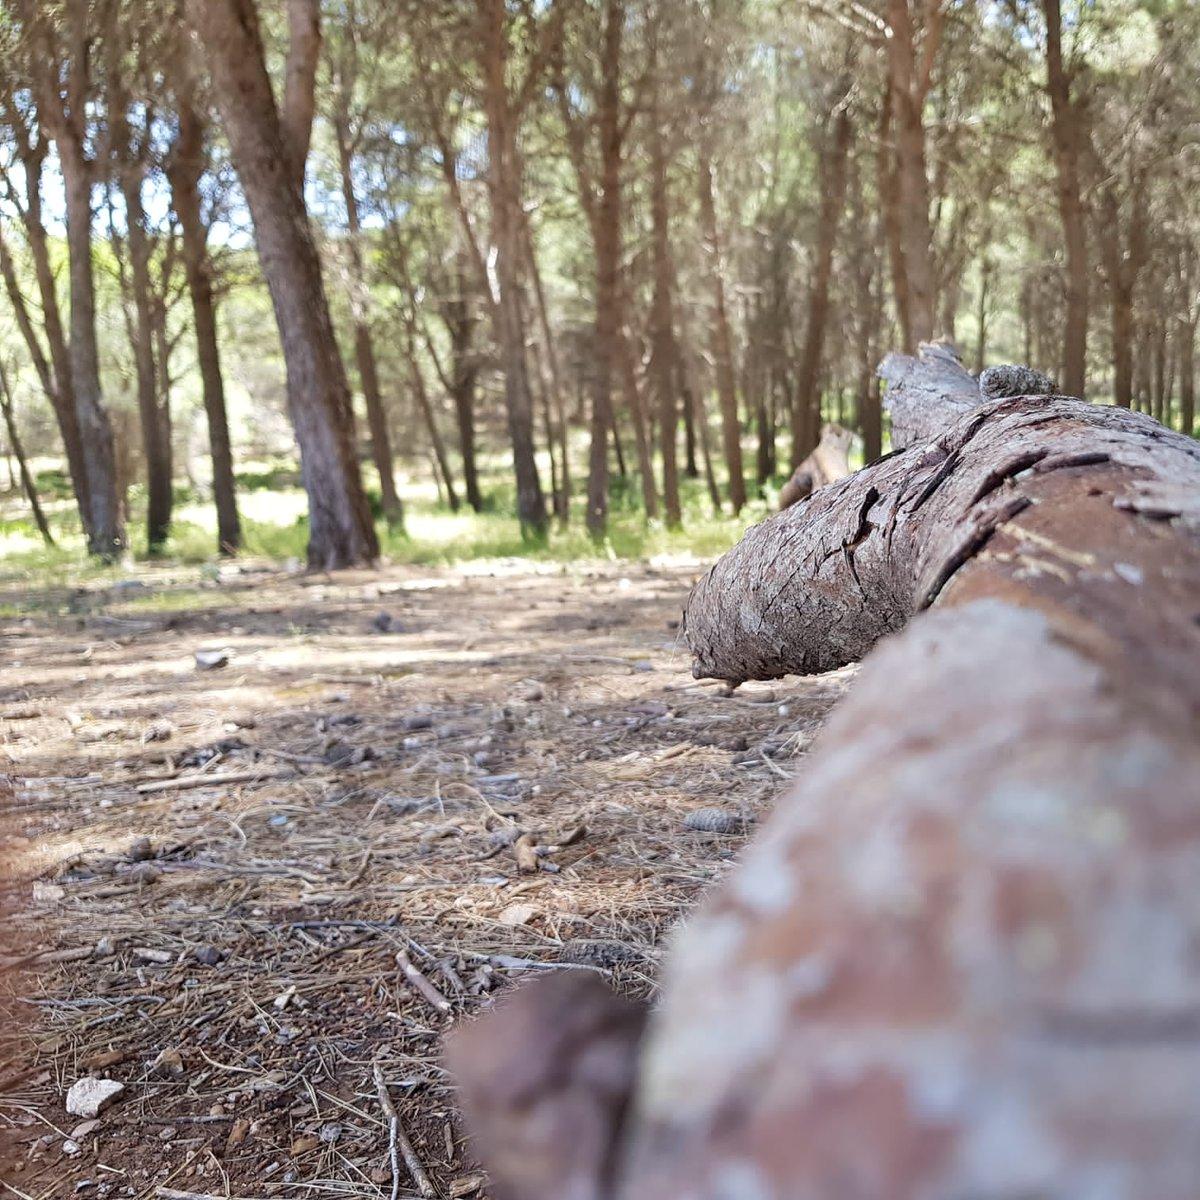 Naturaleza #malaga #nature #naturaleza #lifestyle #konmegan #montaña #mountain #trees #arboles #tronco #bosque #jarapalos #alhaurindelatorre #senderismo #senderos #Senderista #lovemountains pic.twitter.com/g1V2dsFOUn